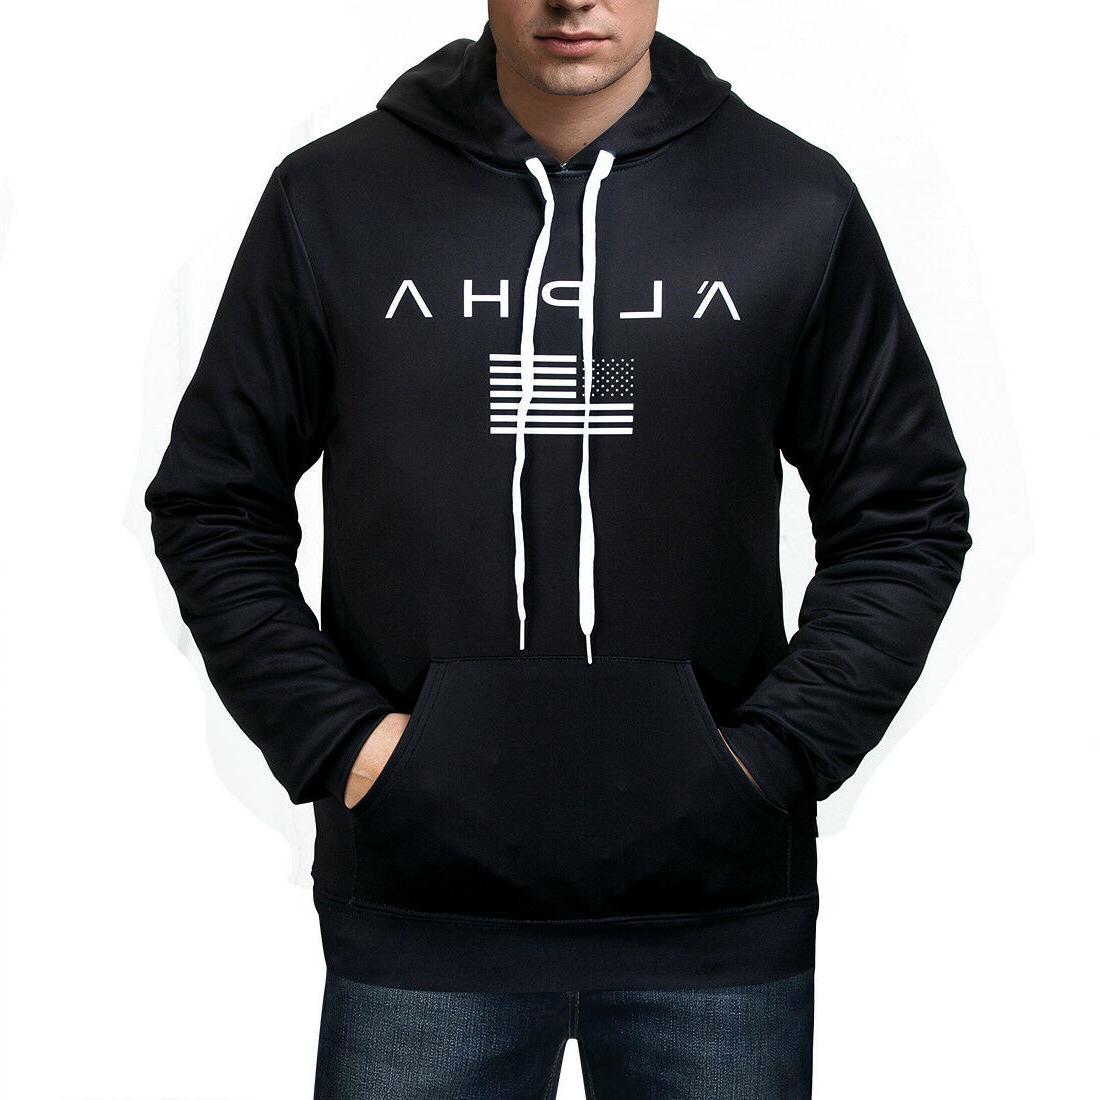 Women/Men UFC Hoodies 3D Print Sweater